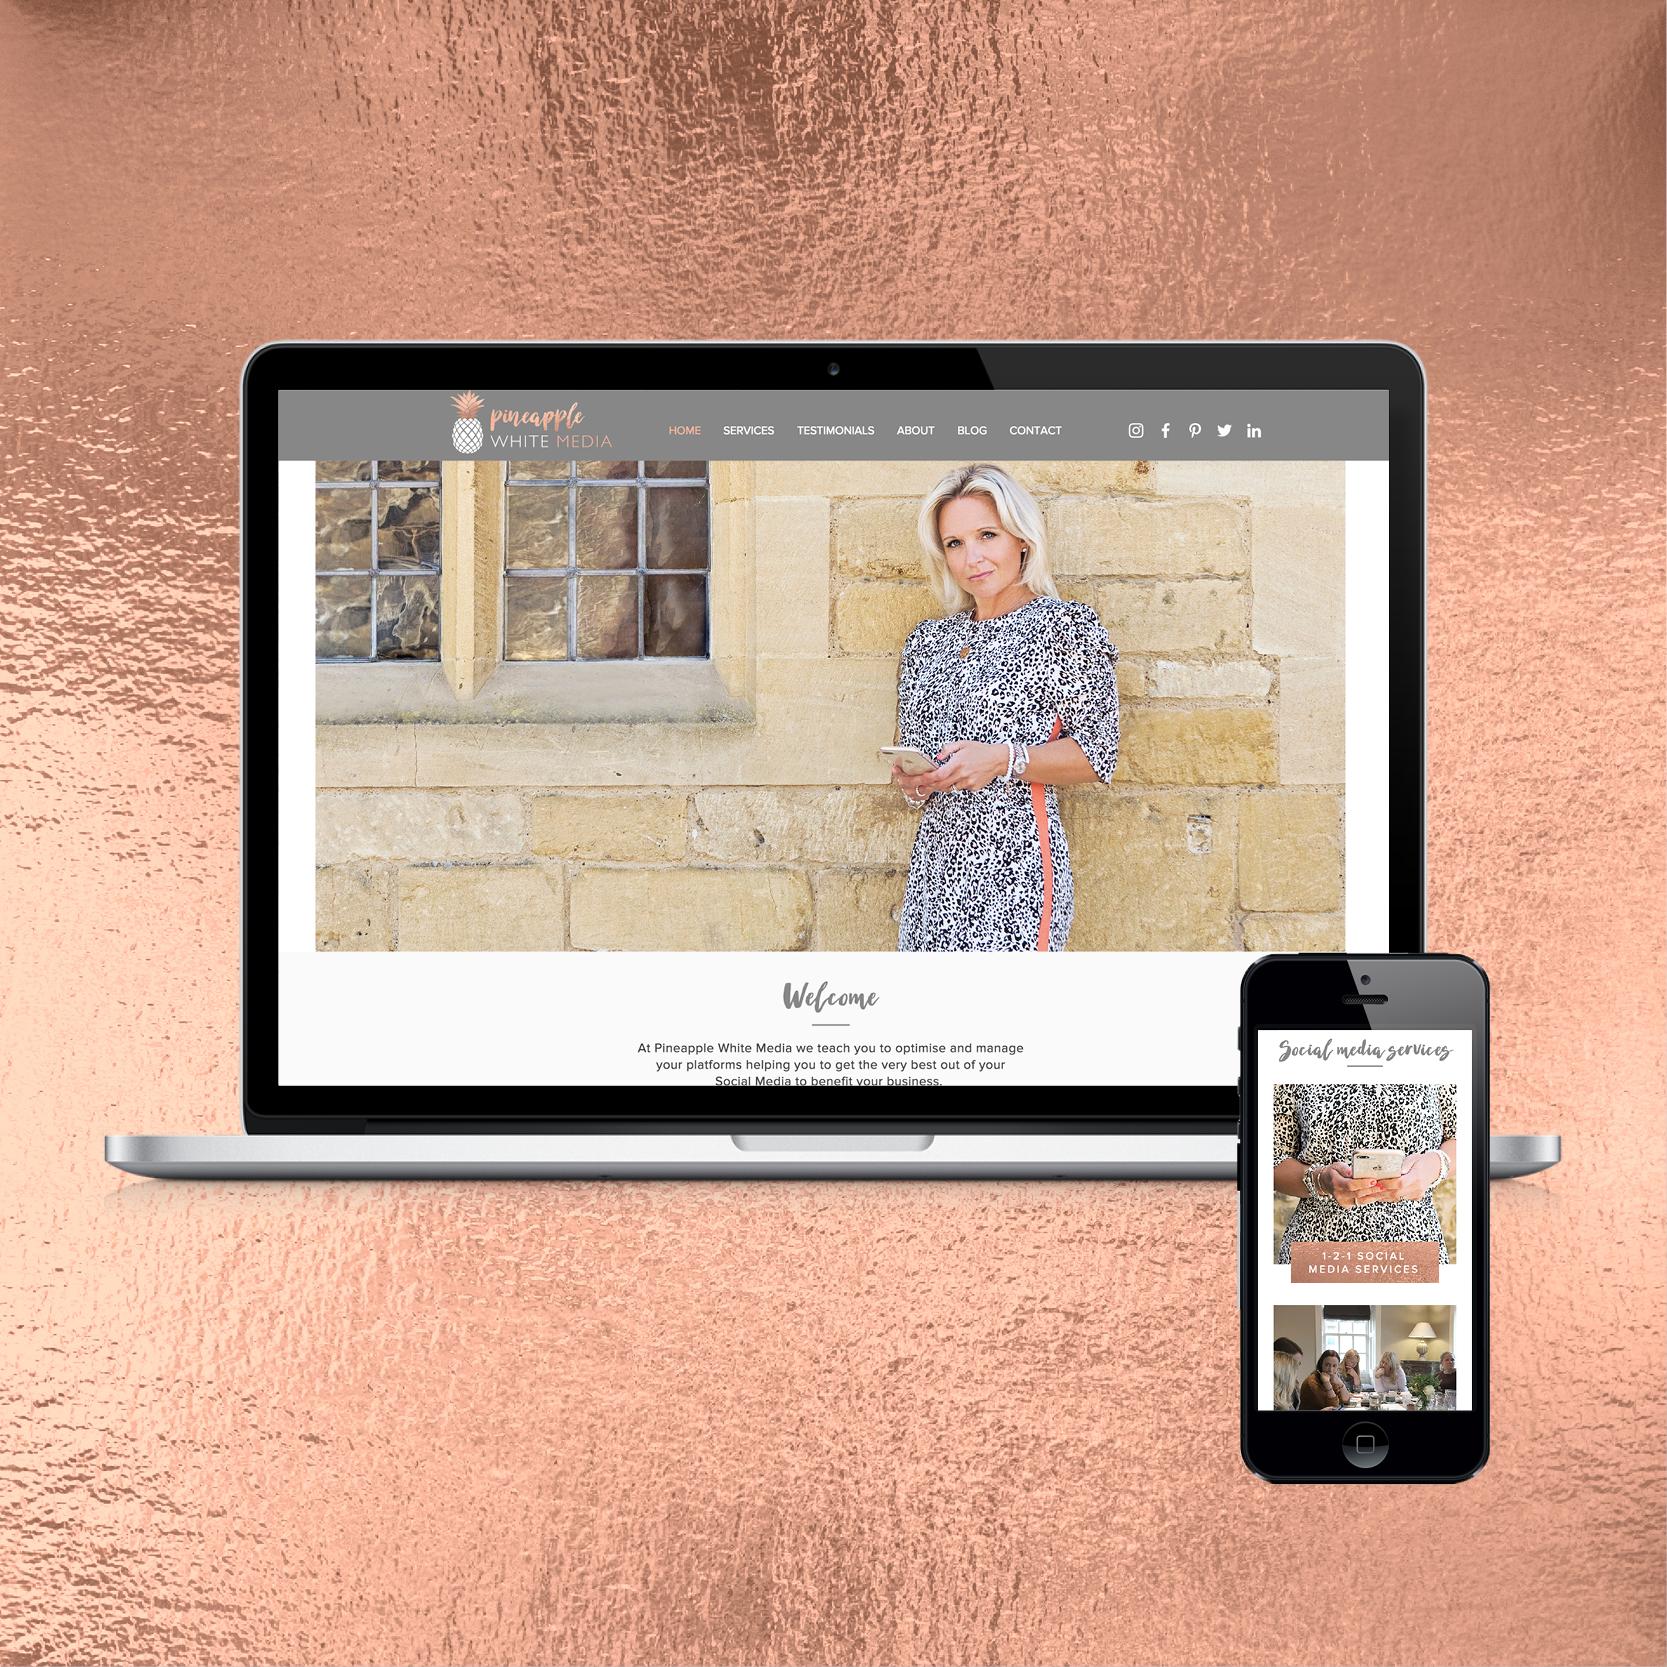 A Website Designed By Rogue Design Cheltenham For Pineapple White Media Social Media Train Social Media Coaching Social Media Training Social Media Consultant